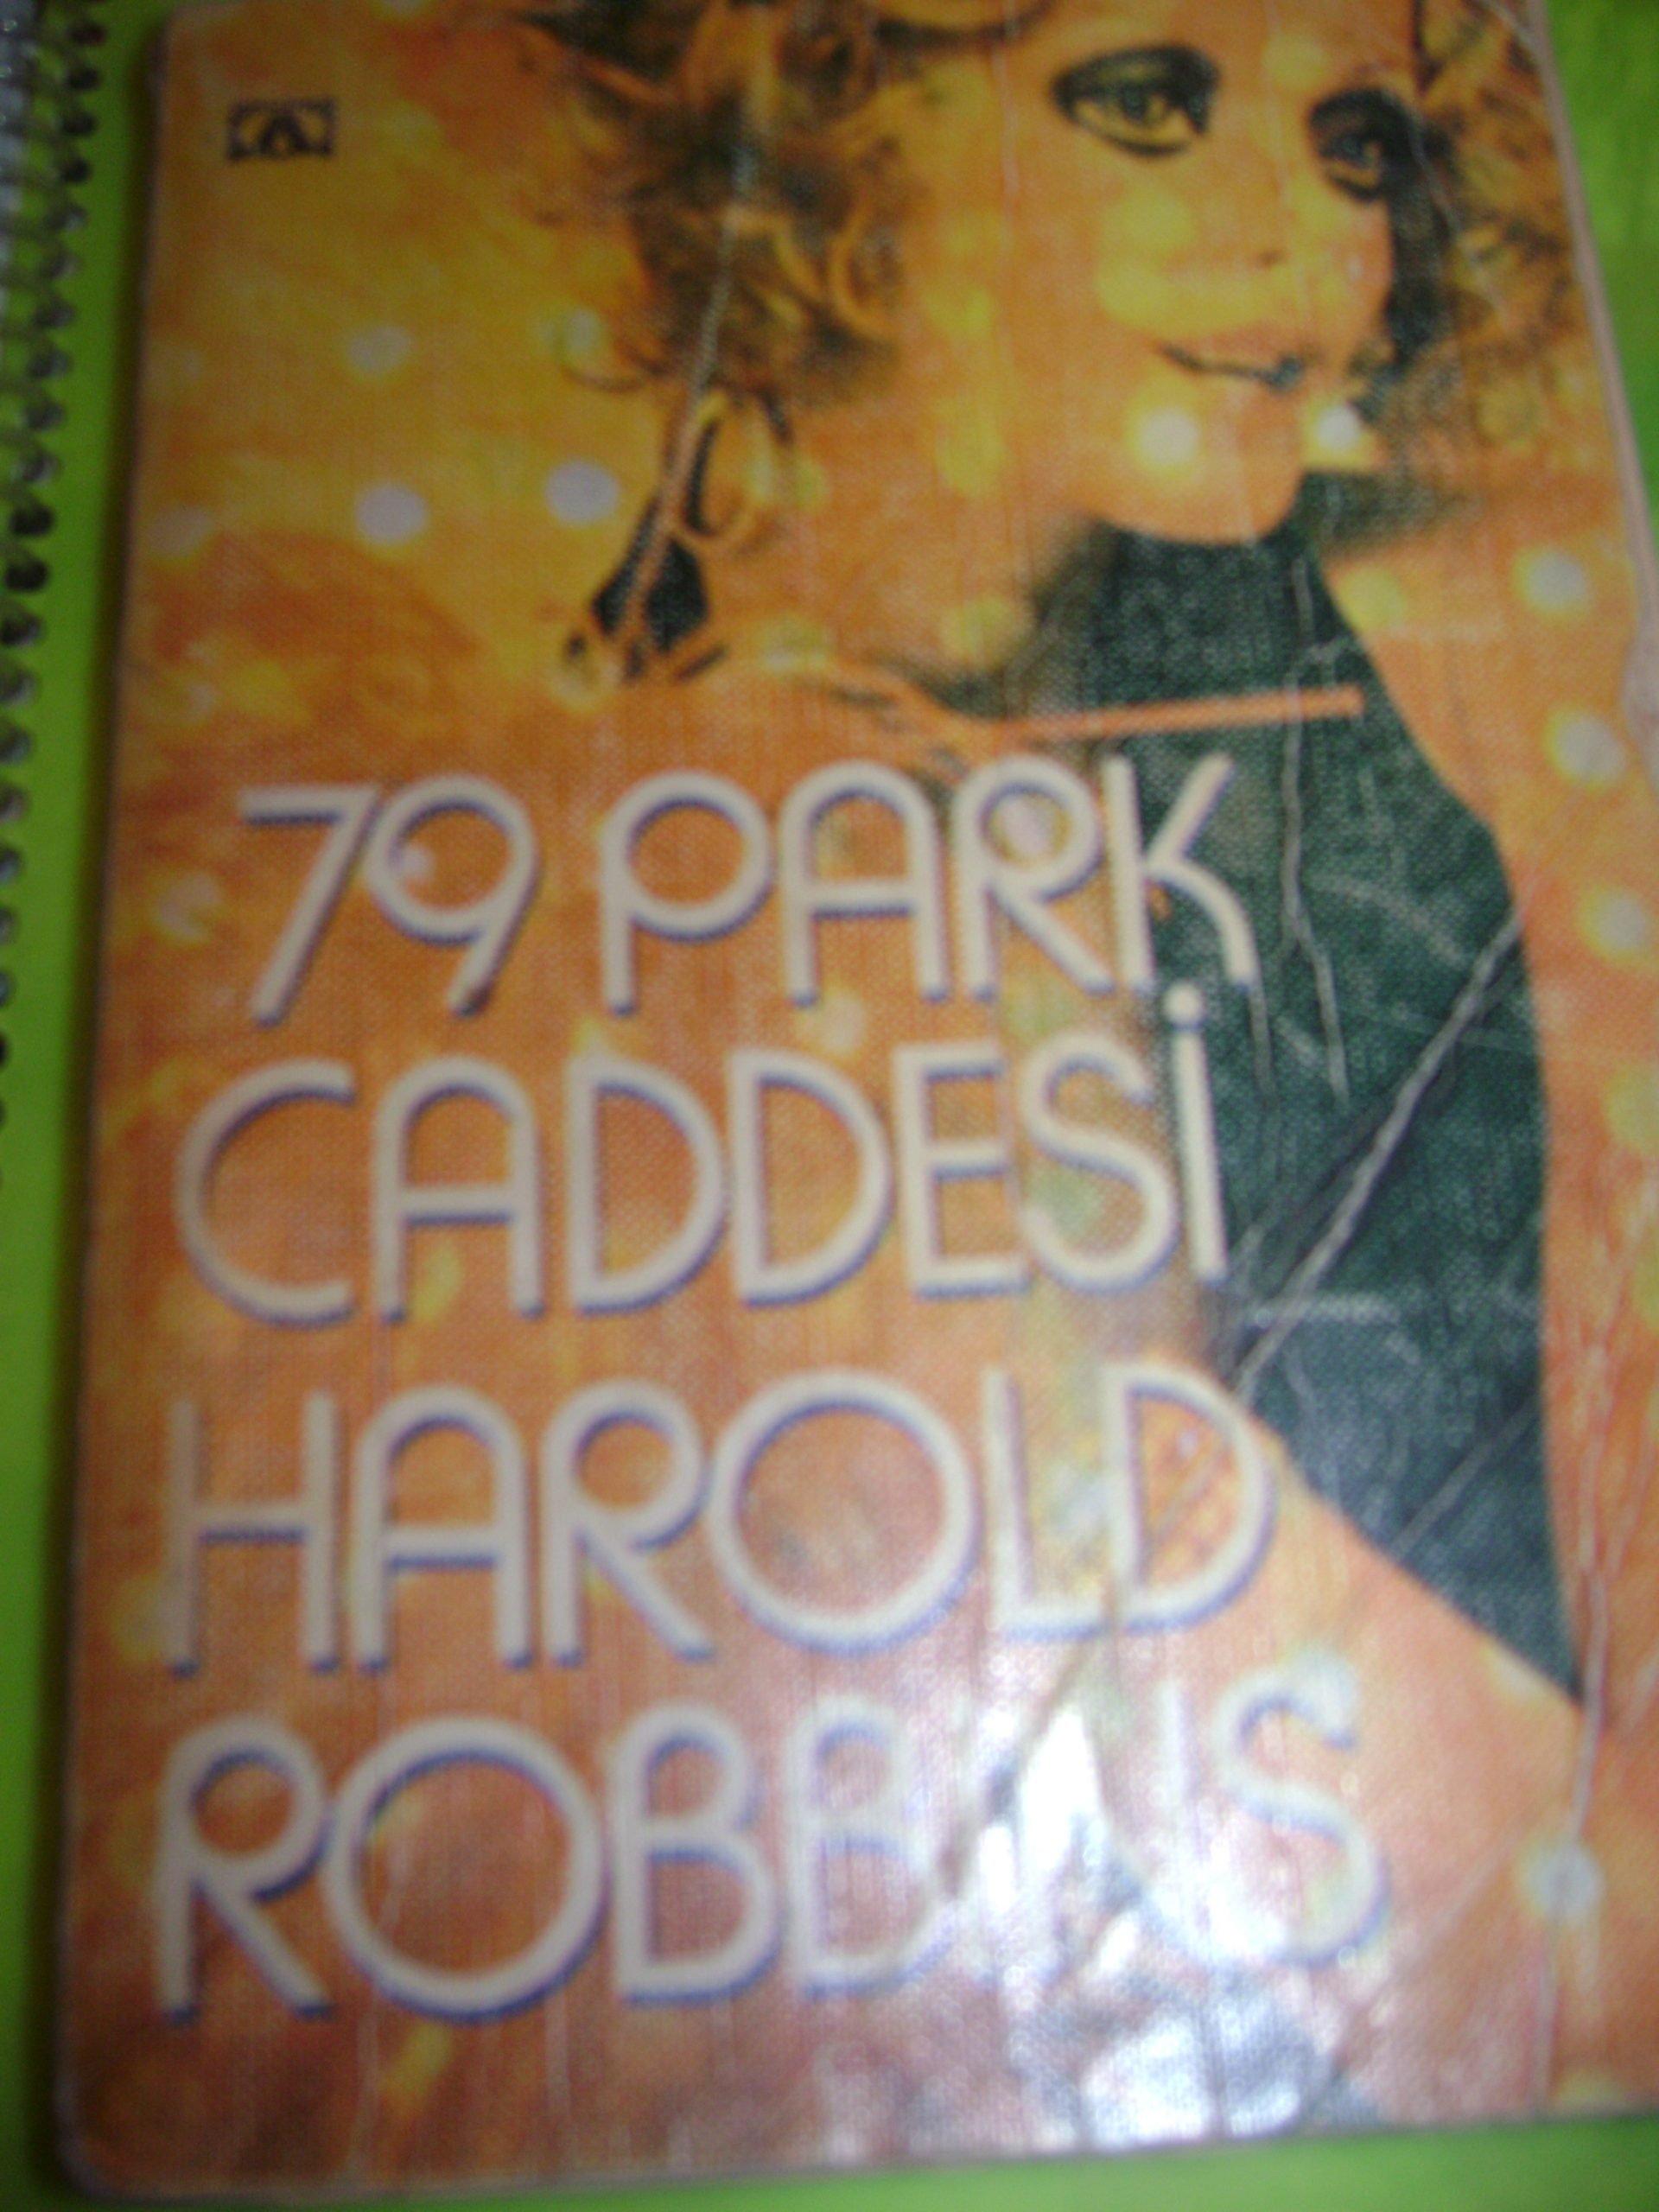 79 park caddesi& Harold ROBBINS/10 TL